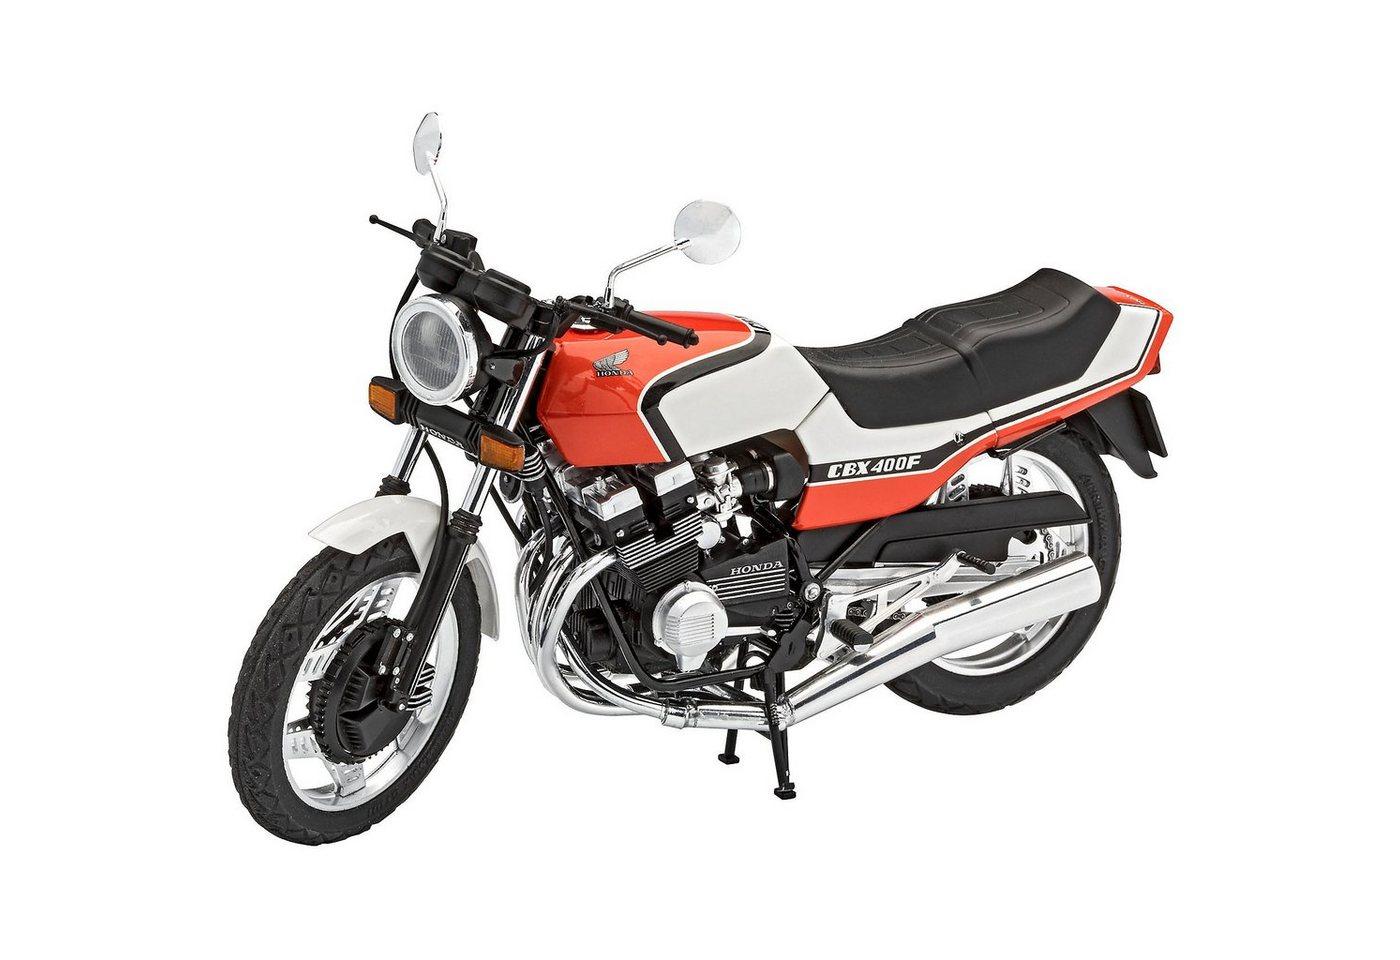 Revell® Modellbausatz Honda CBX 400 F